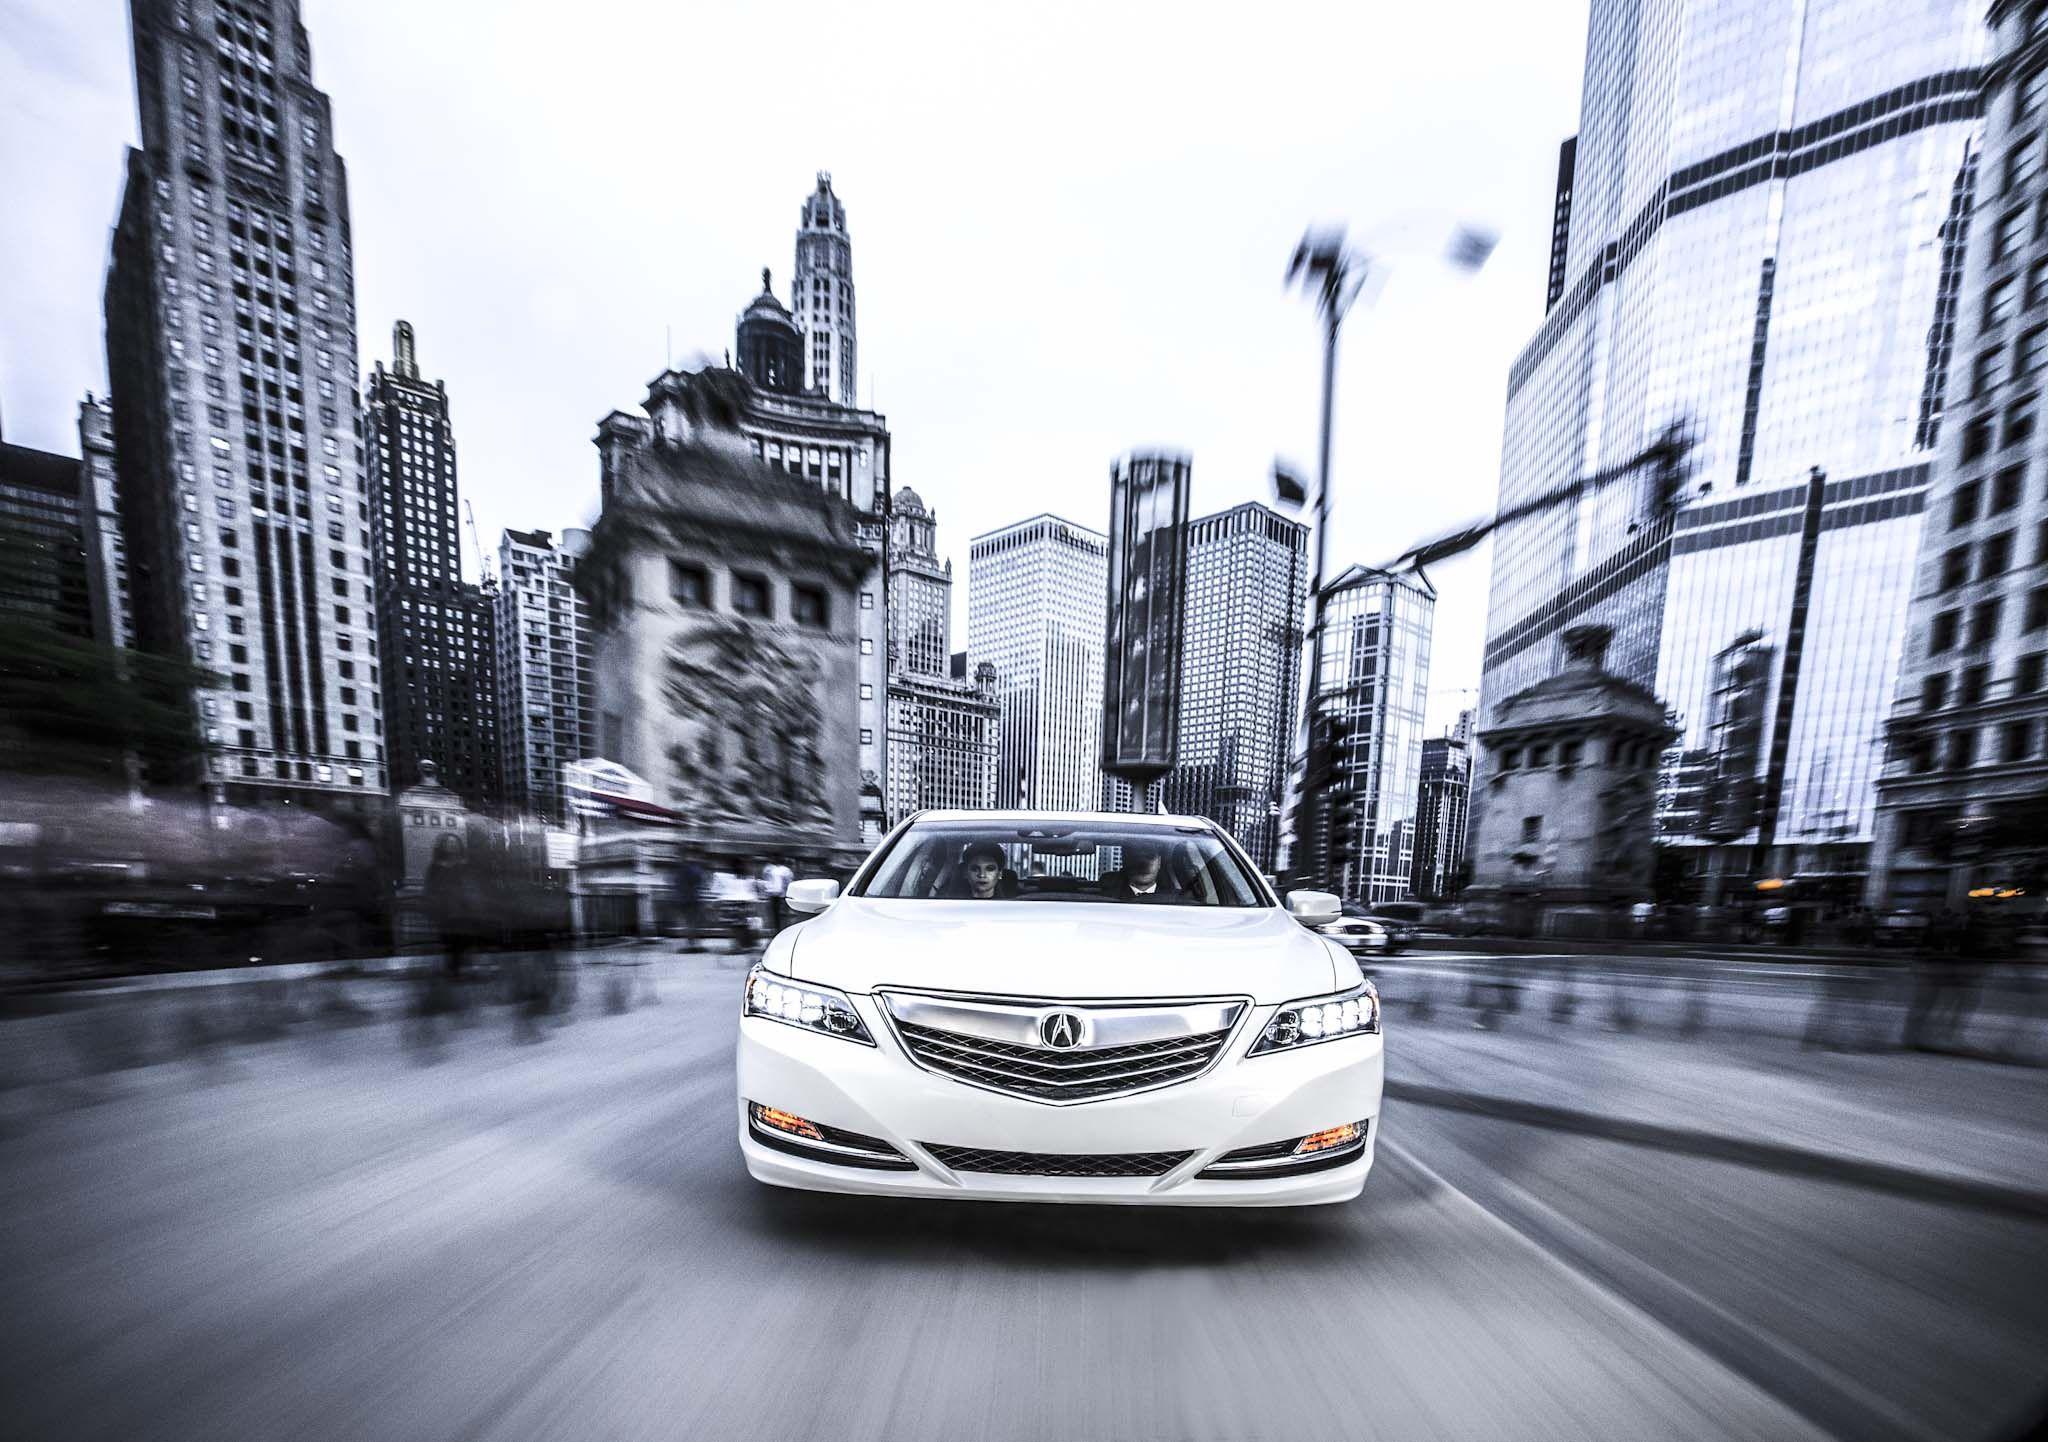 RLX photo shoot with designer Nora Del Busto, Chicago, IL .  Amazing photo editing #Acura #RLX